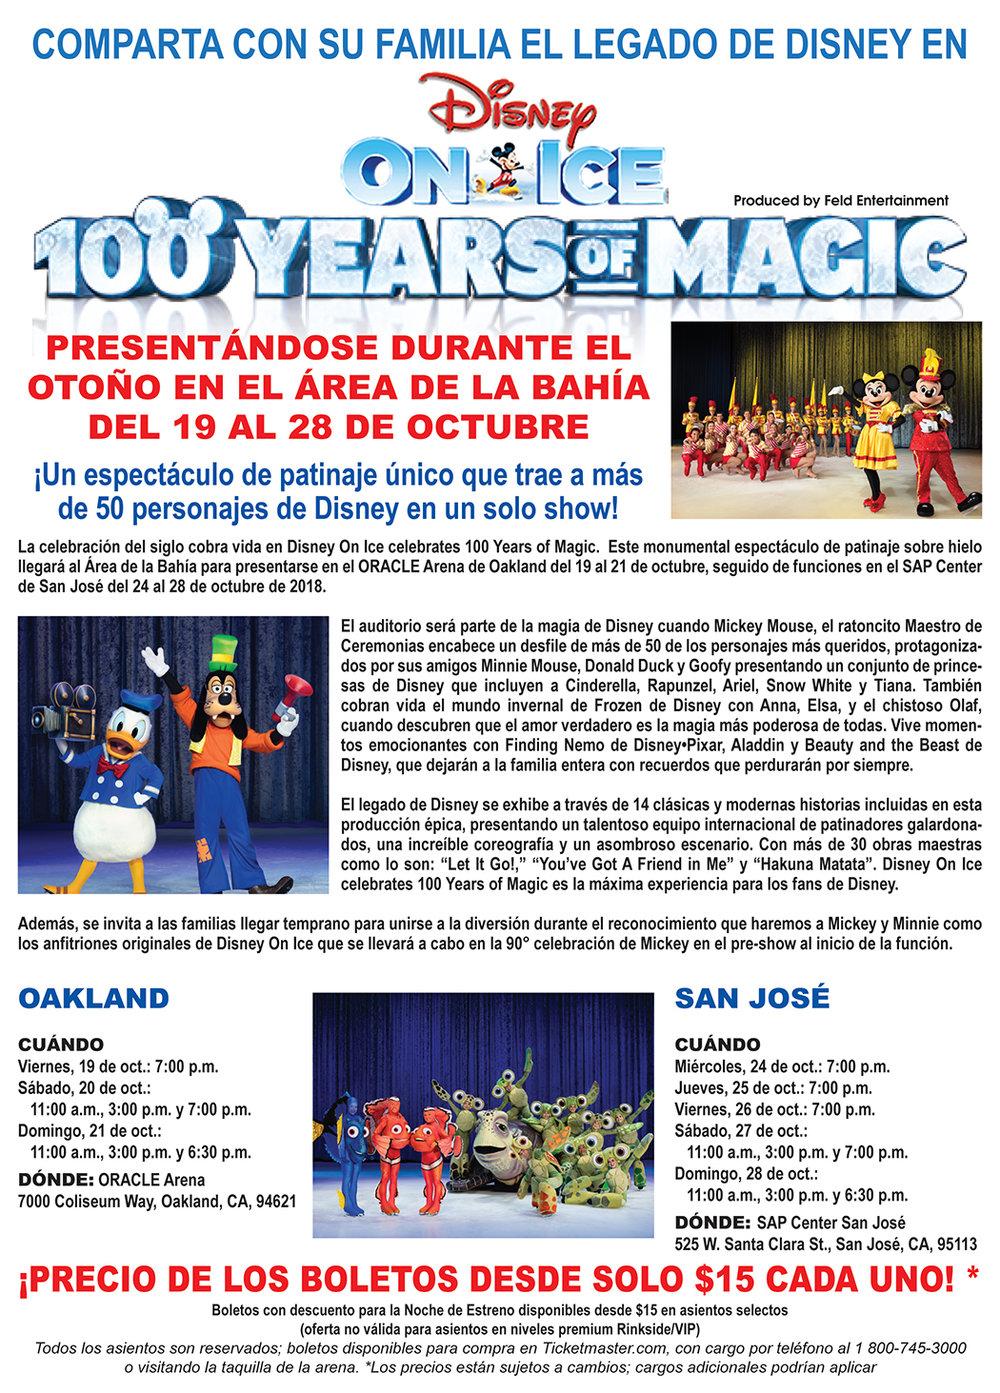 Disney On Ice 100 - octu 2018-01.jpg